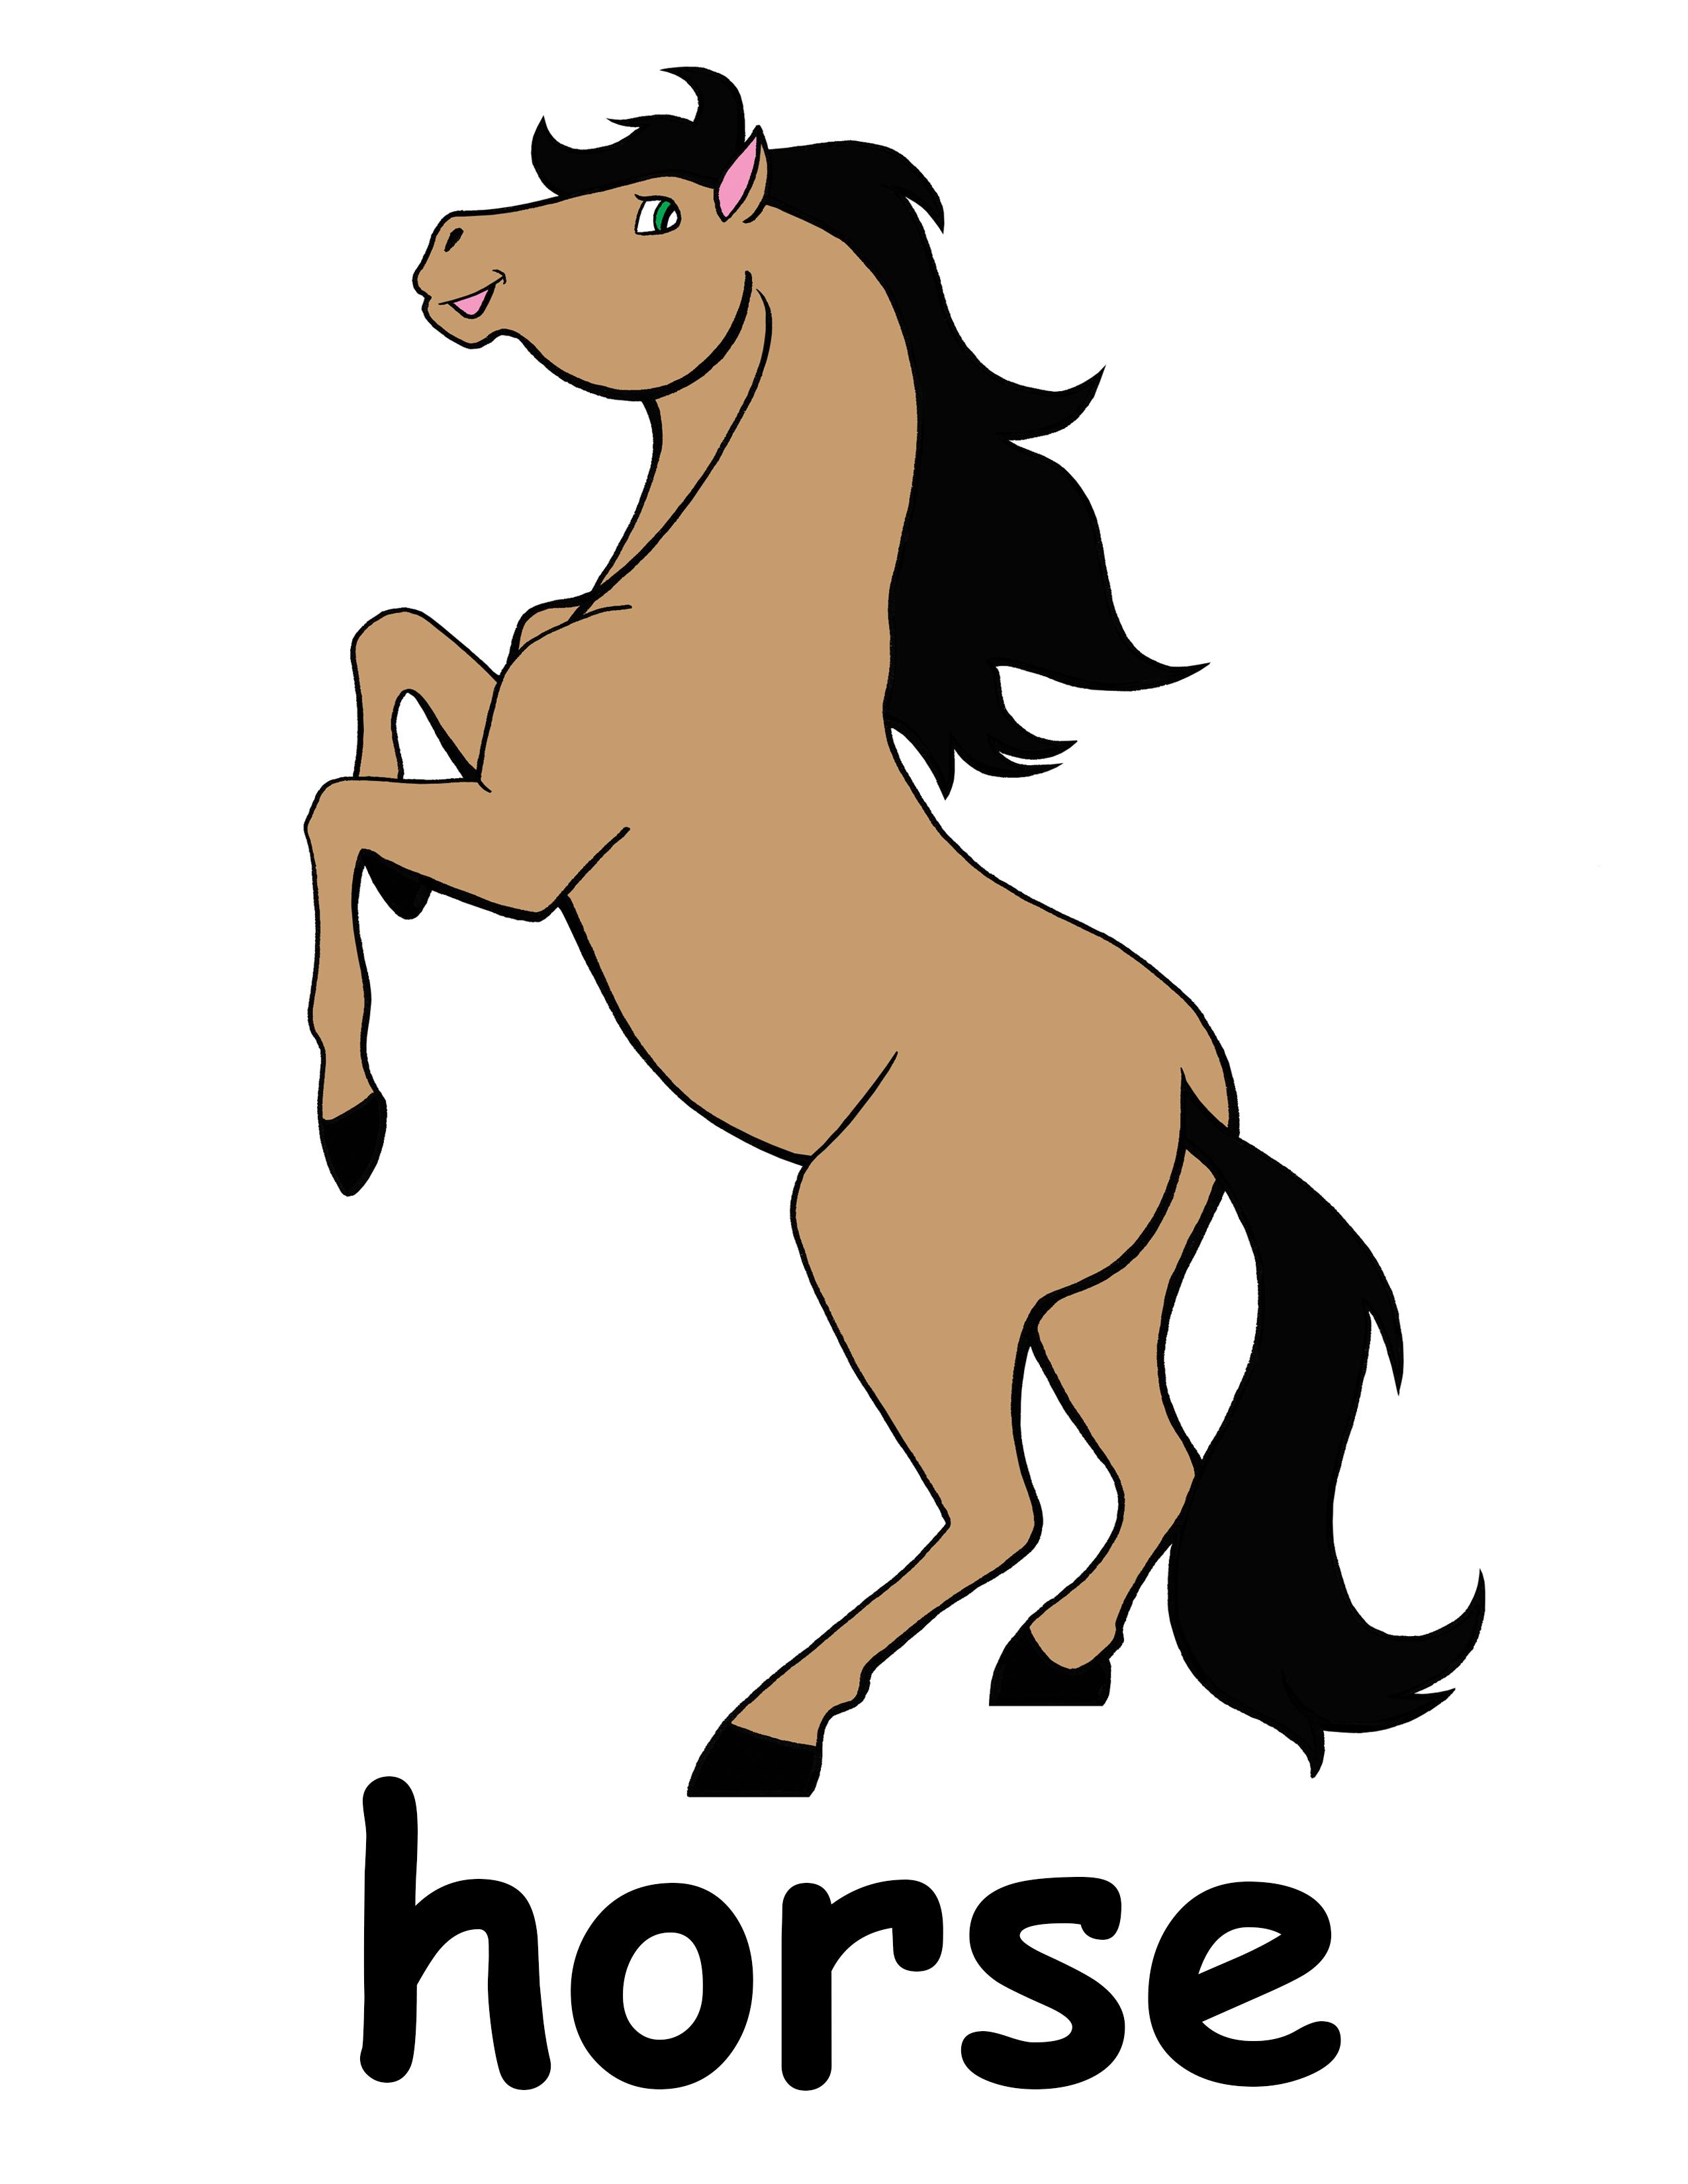 Horse clipart 8.